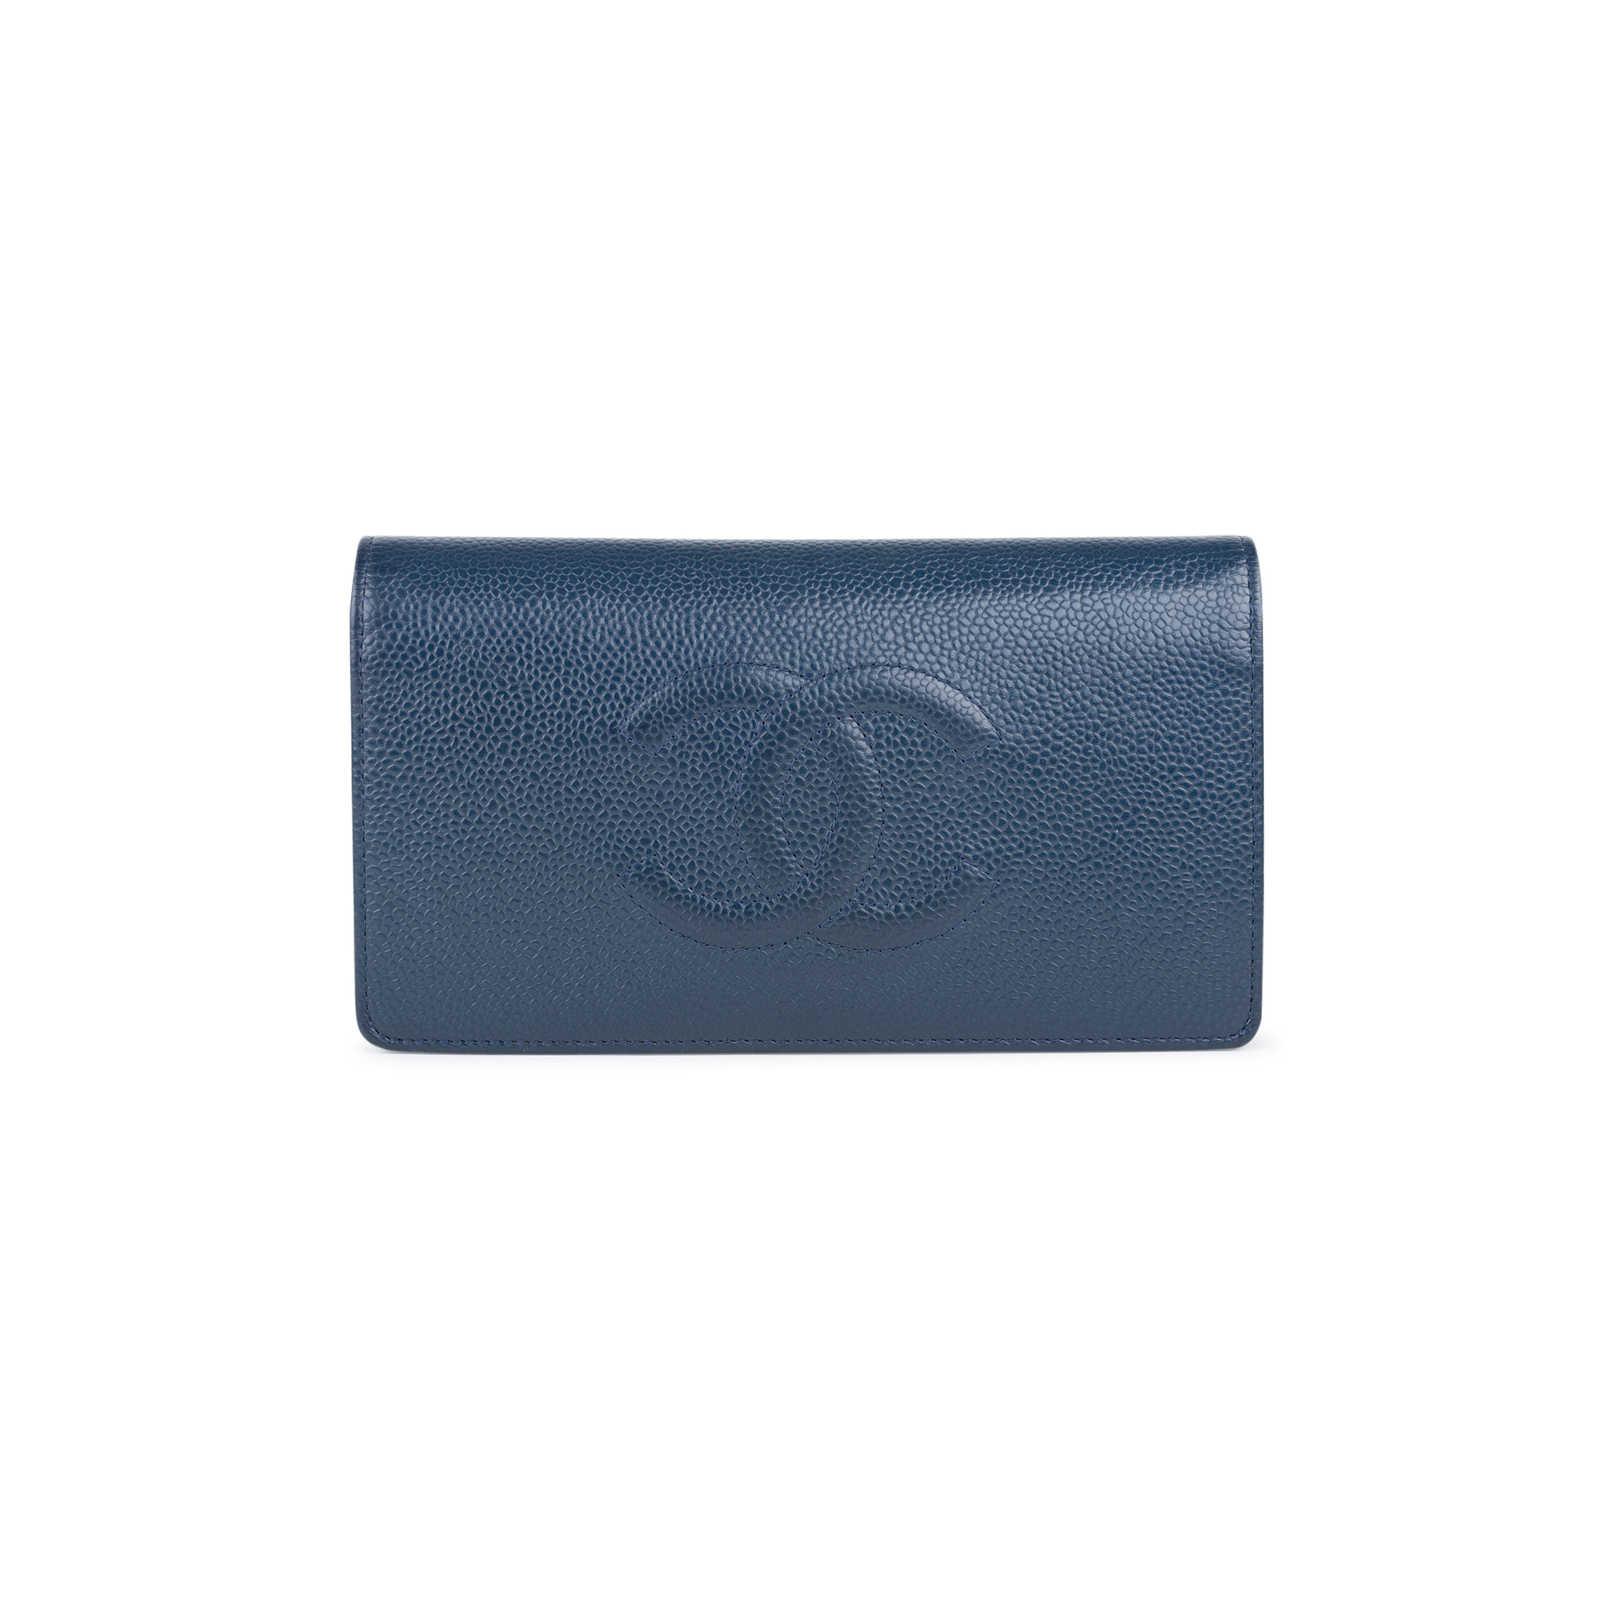 14dd39de25eebb Authentic Second Hand Chanel Caviar Yen Wallet (PSS-547-00012) - Thumbnail  ...